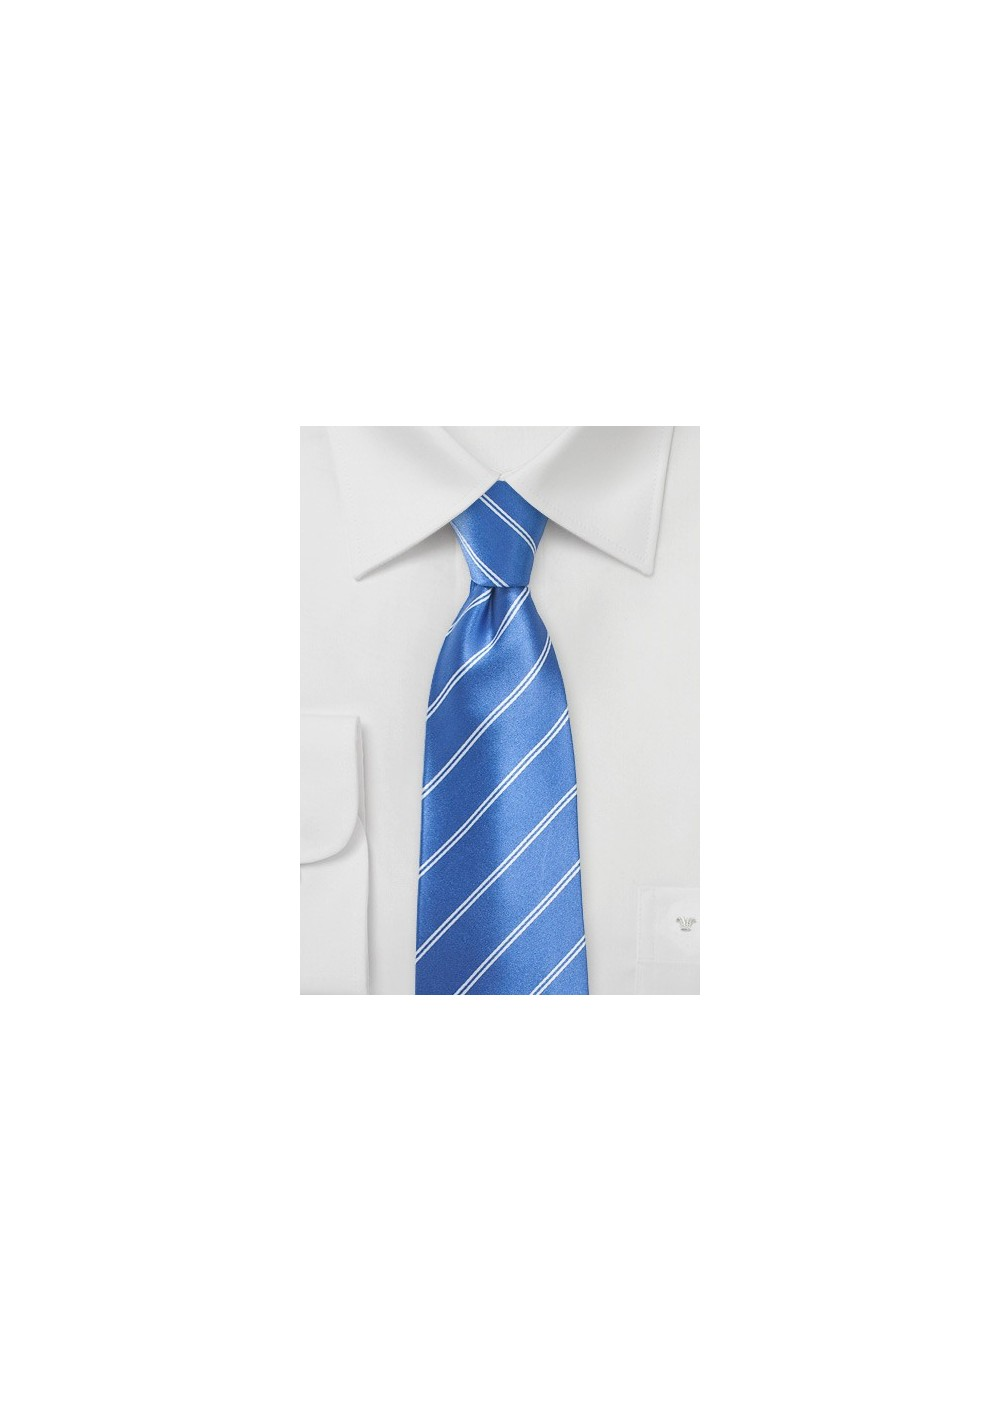 Sky-Blue Necktie with Double Pin Stripe